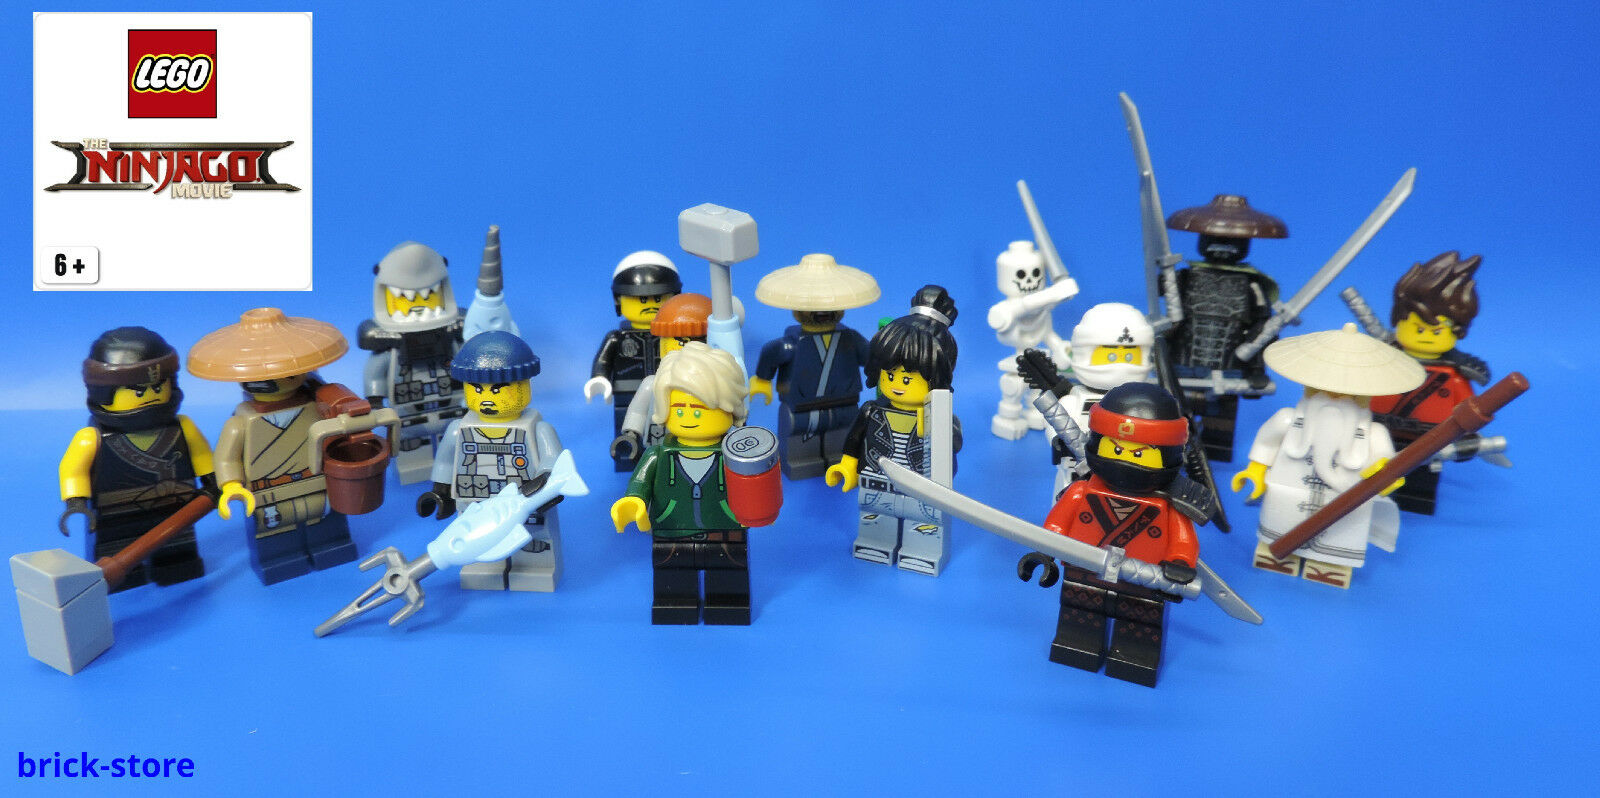 Lego 71019-Ninjago Movie minifigure-Limited Collector series minifigs-misb